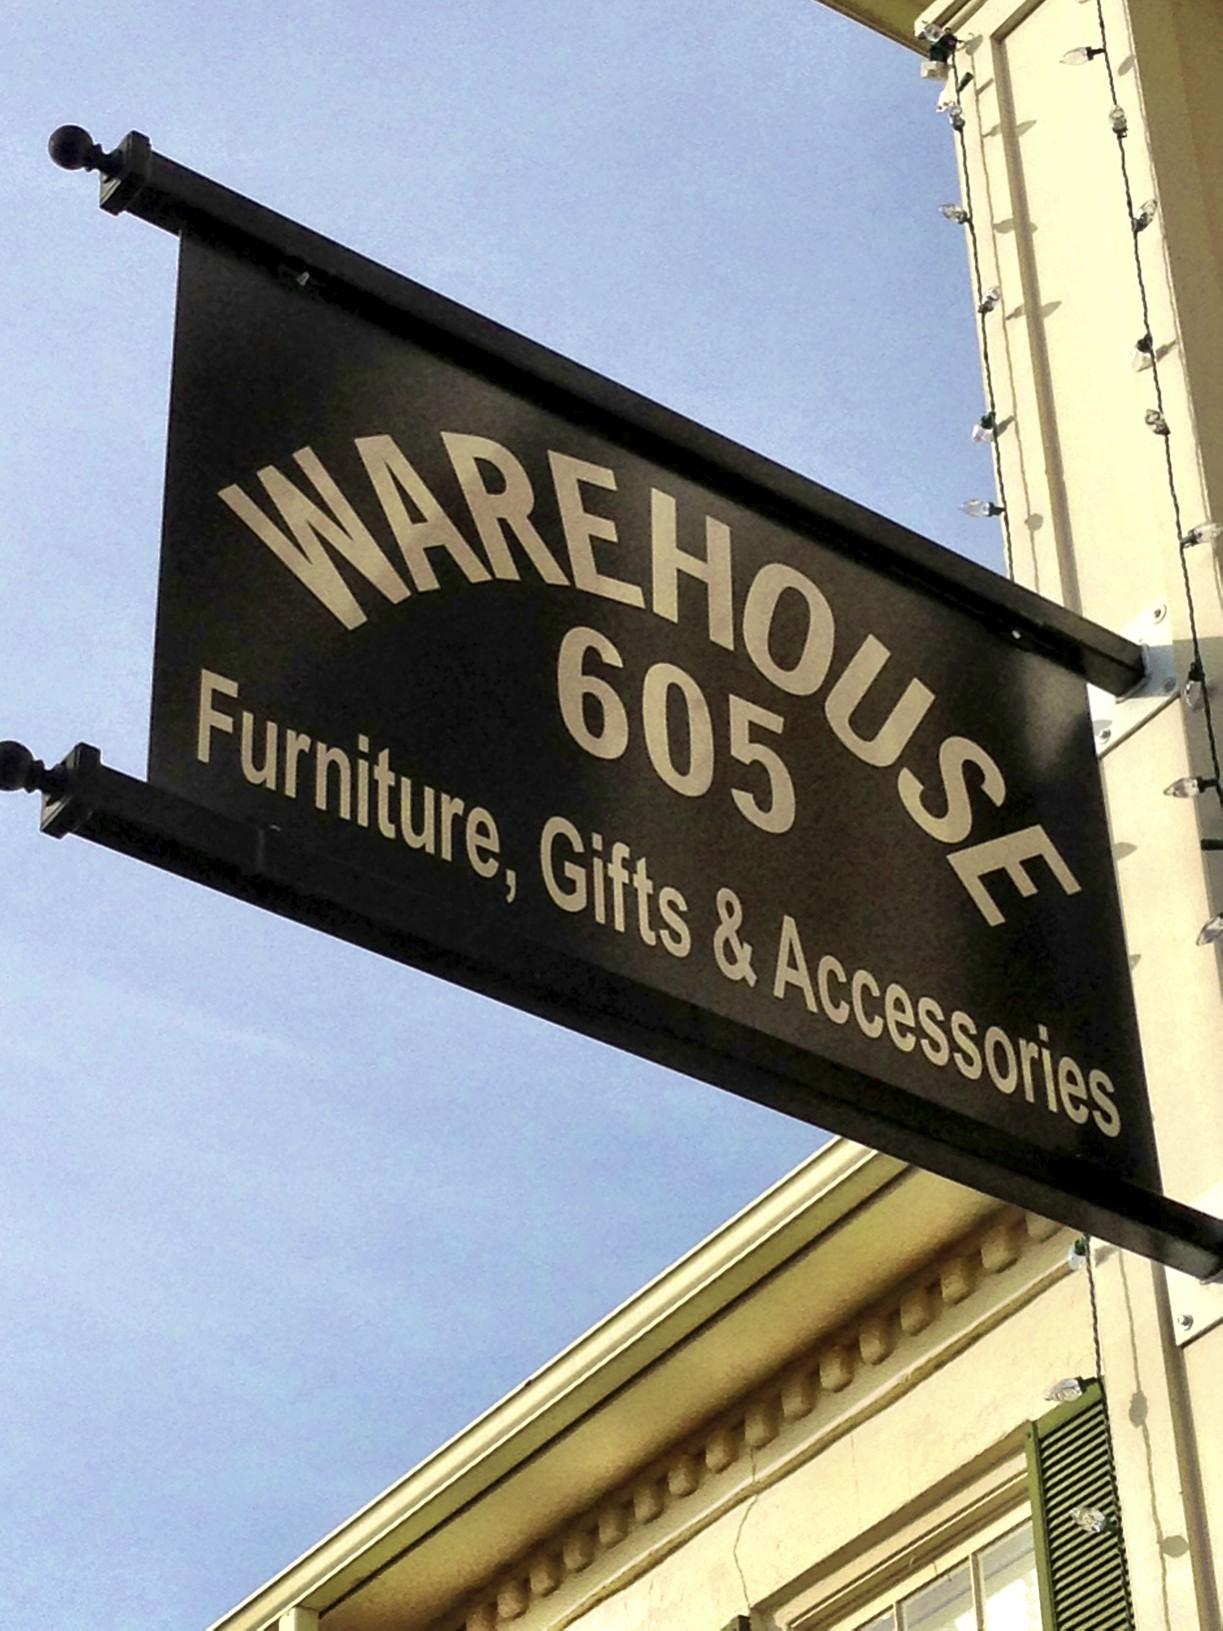 Warehouse 605